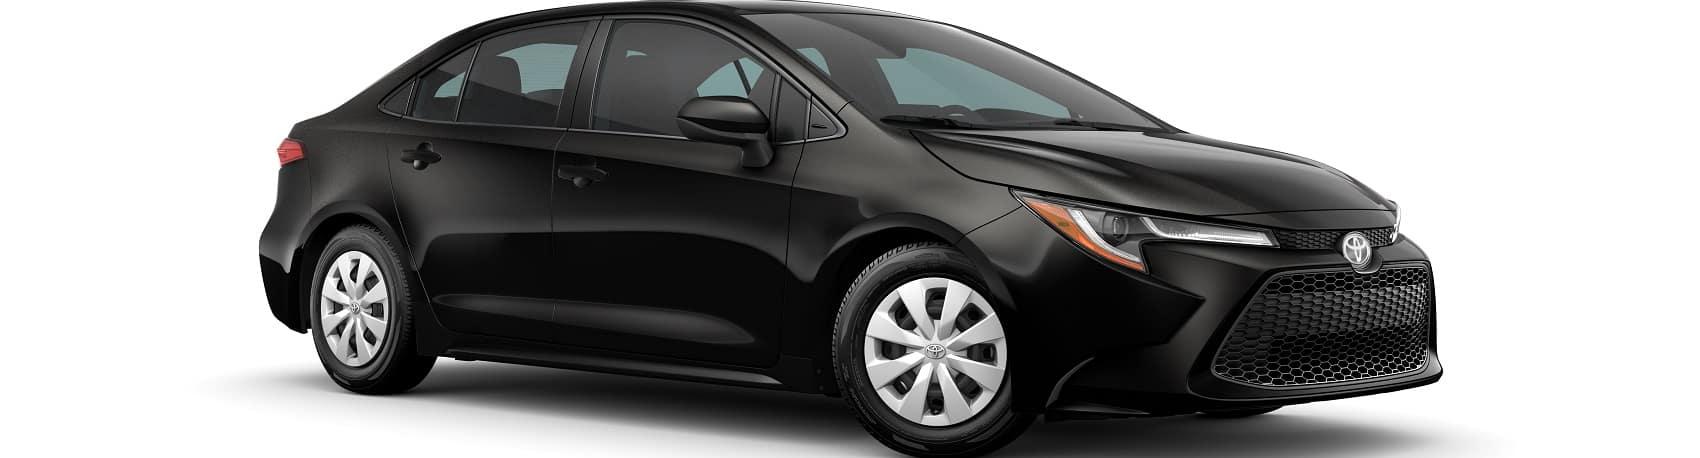 2020 Toyota Corolla Black